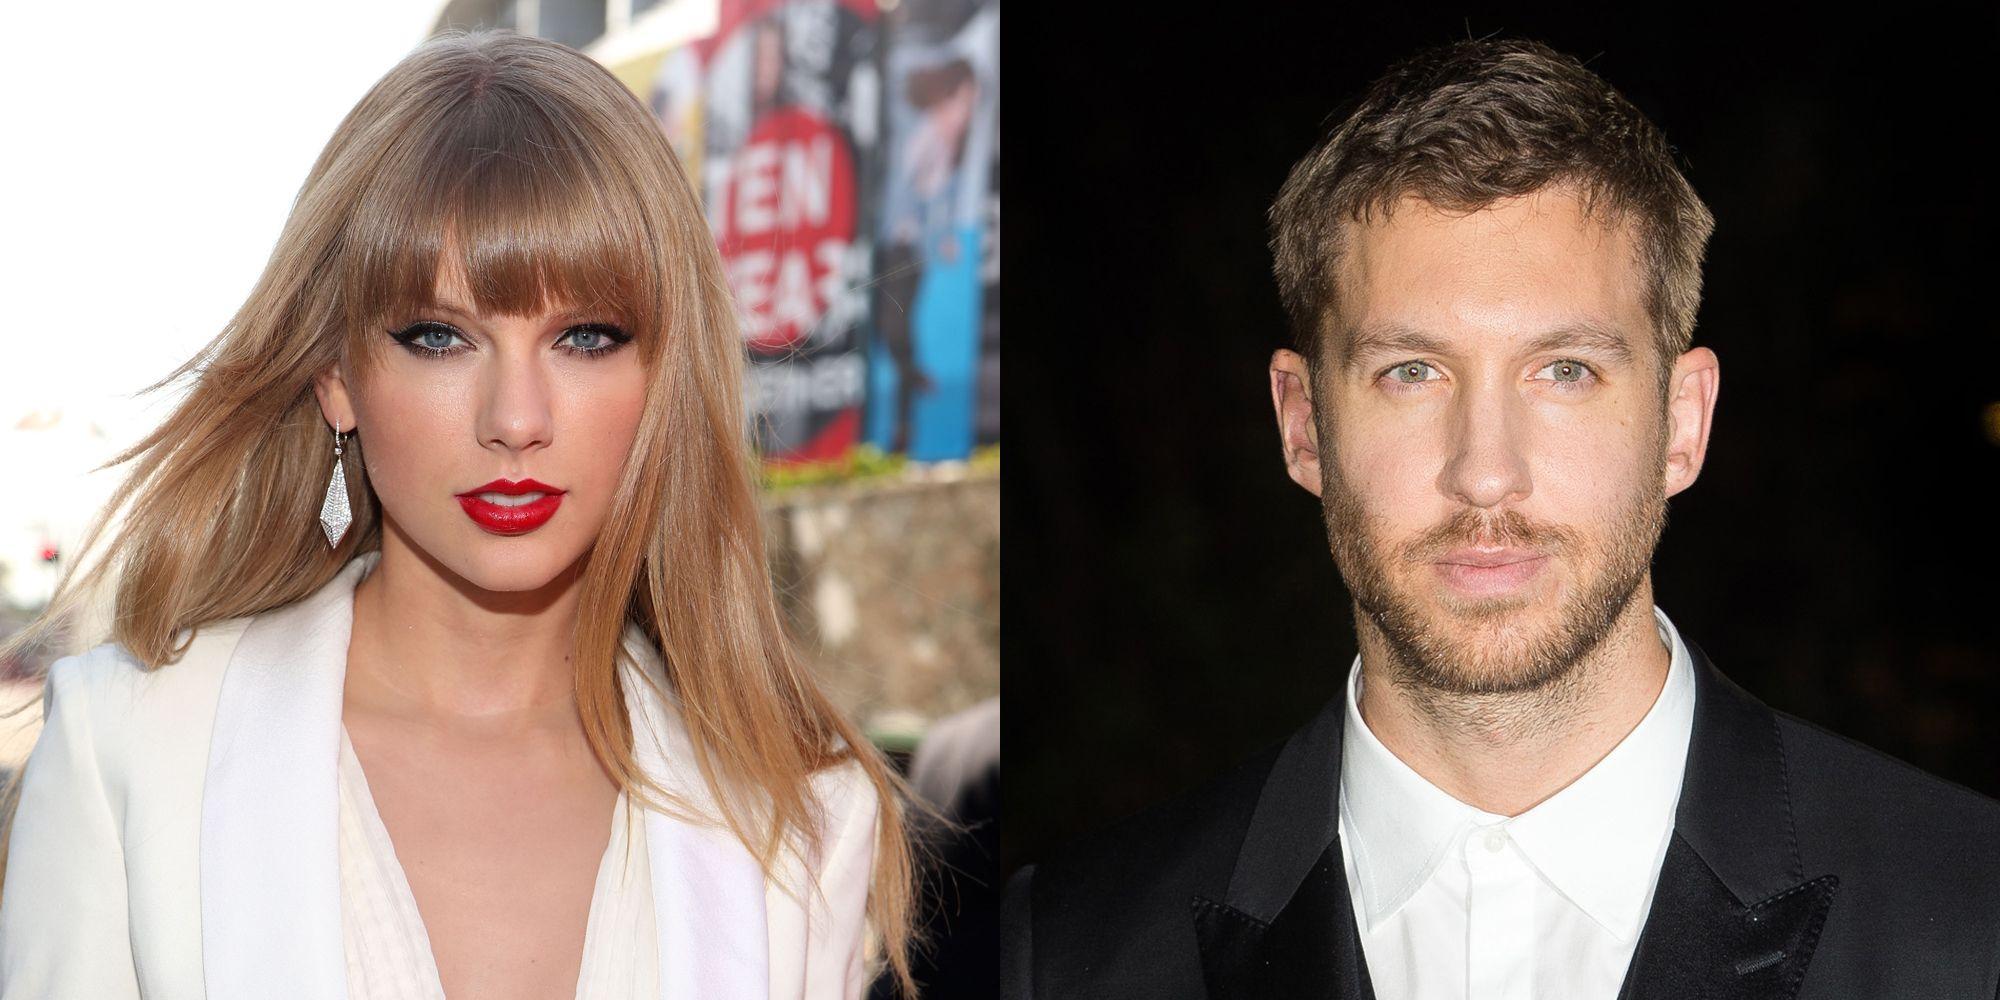 Swift playboy taylor Taylor Swift